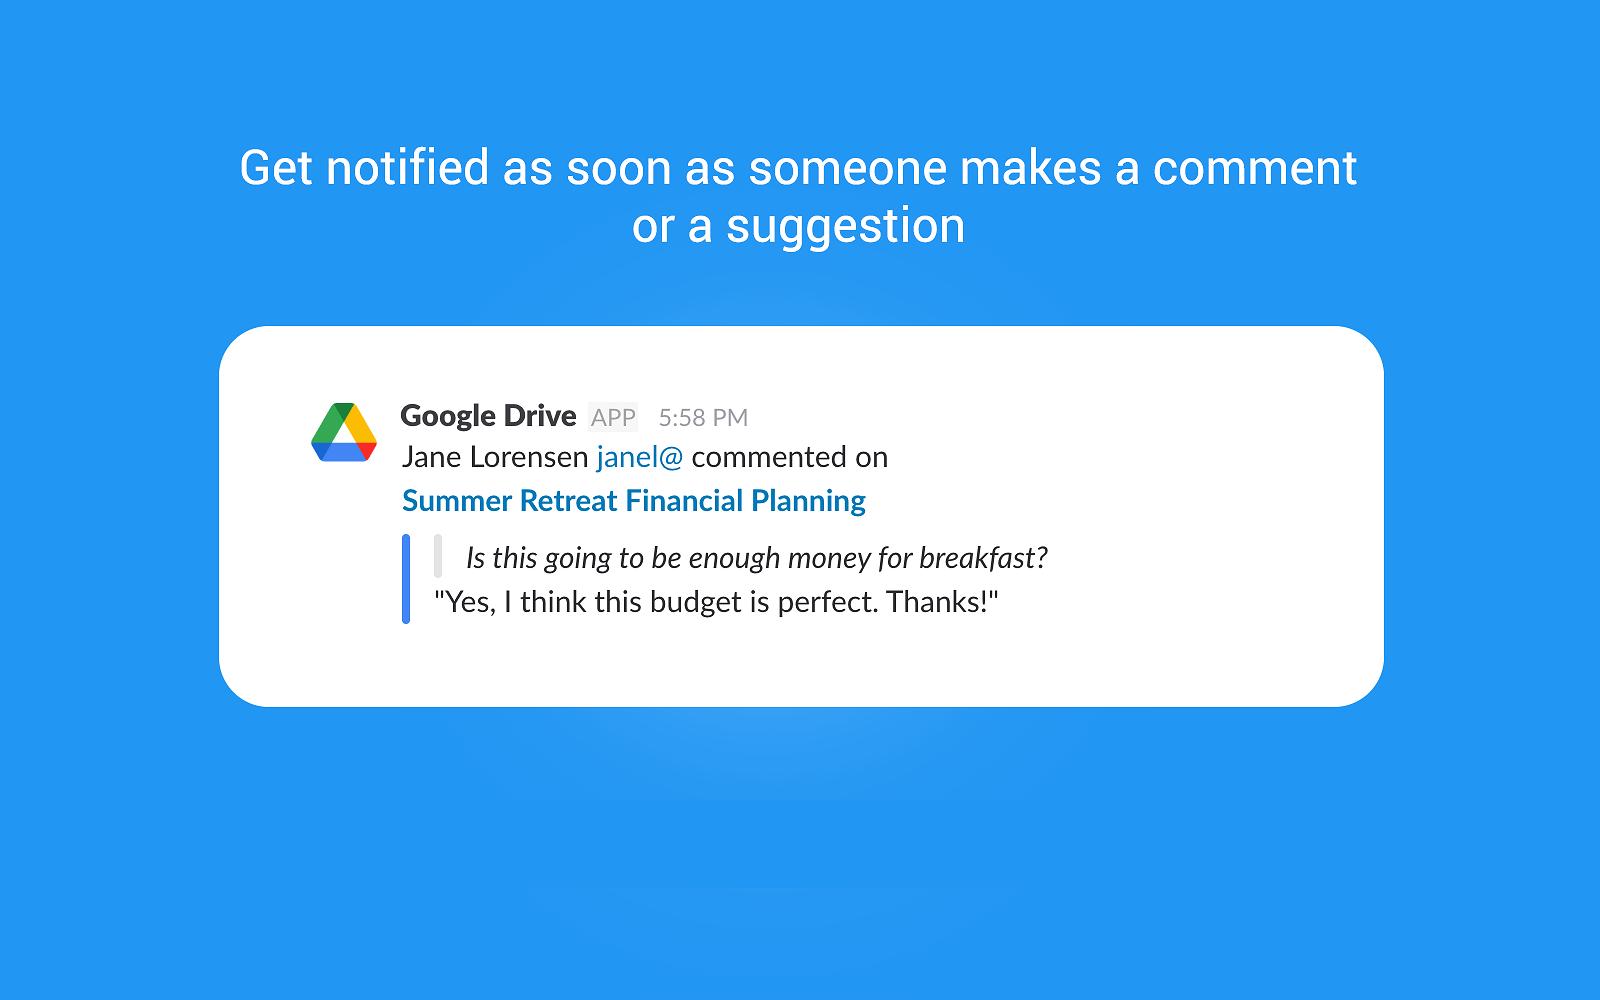 Google Drive Slack app